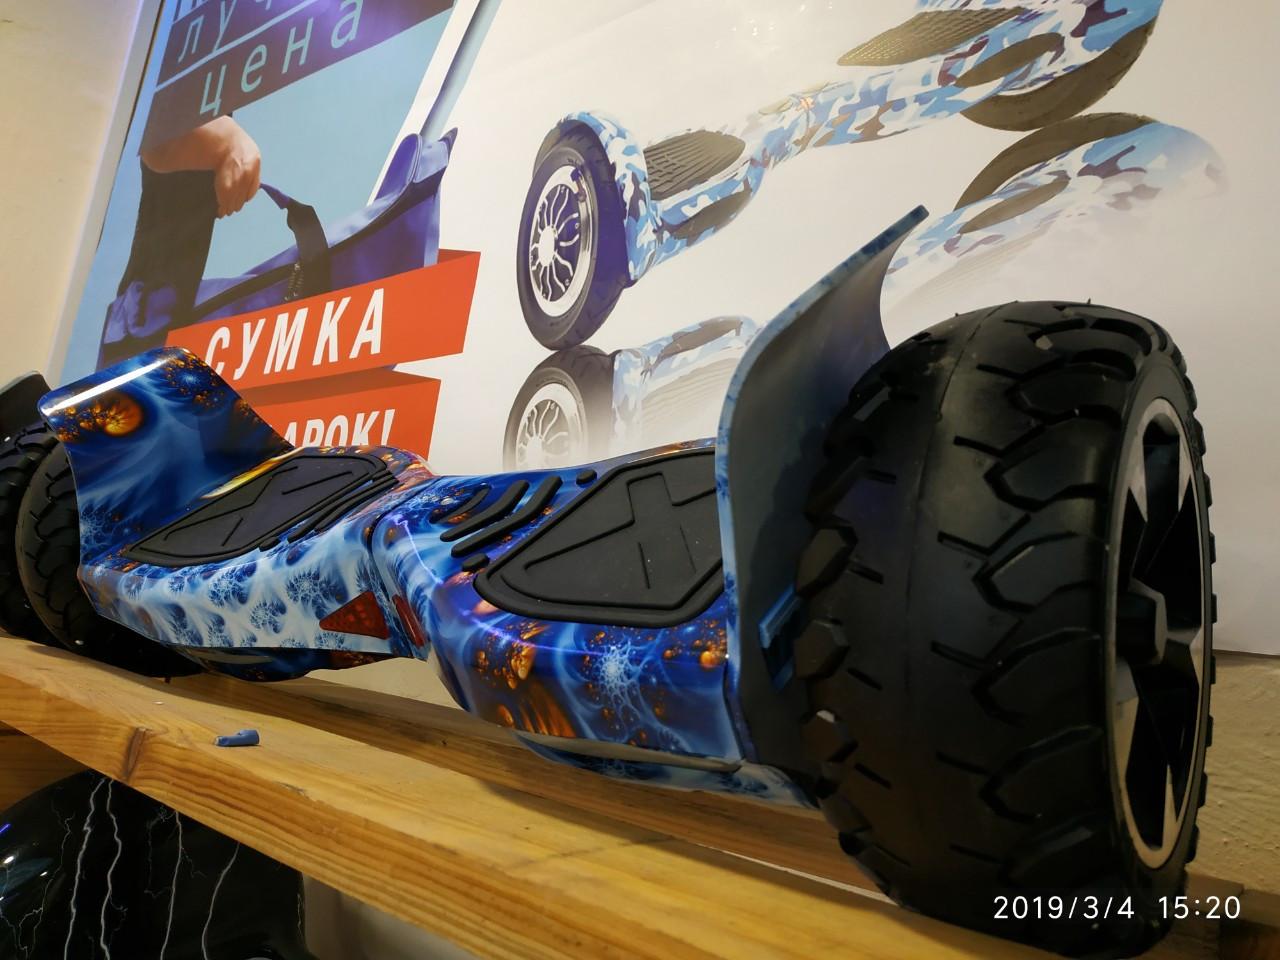 SmartWay Kiwano KO-X PRO 1100W мечта